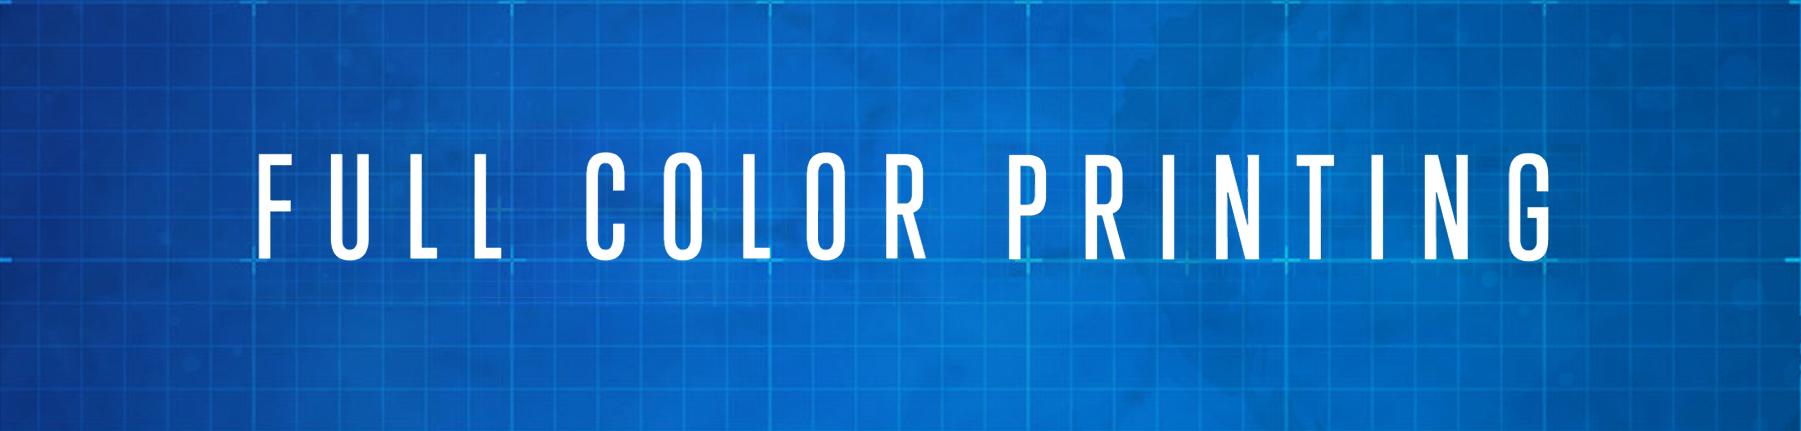 full-color-printing.png